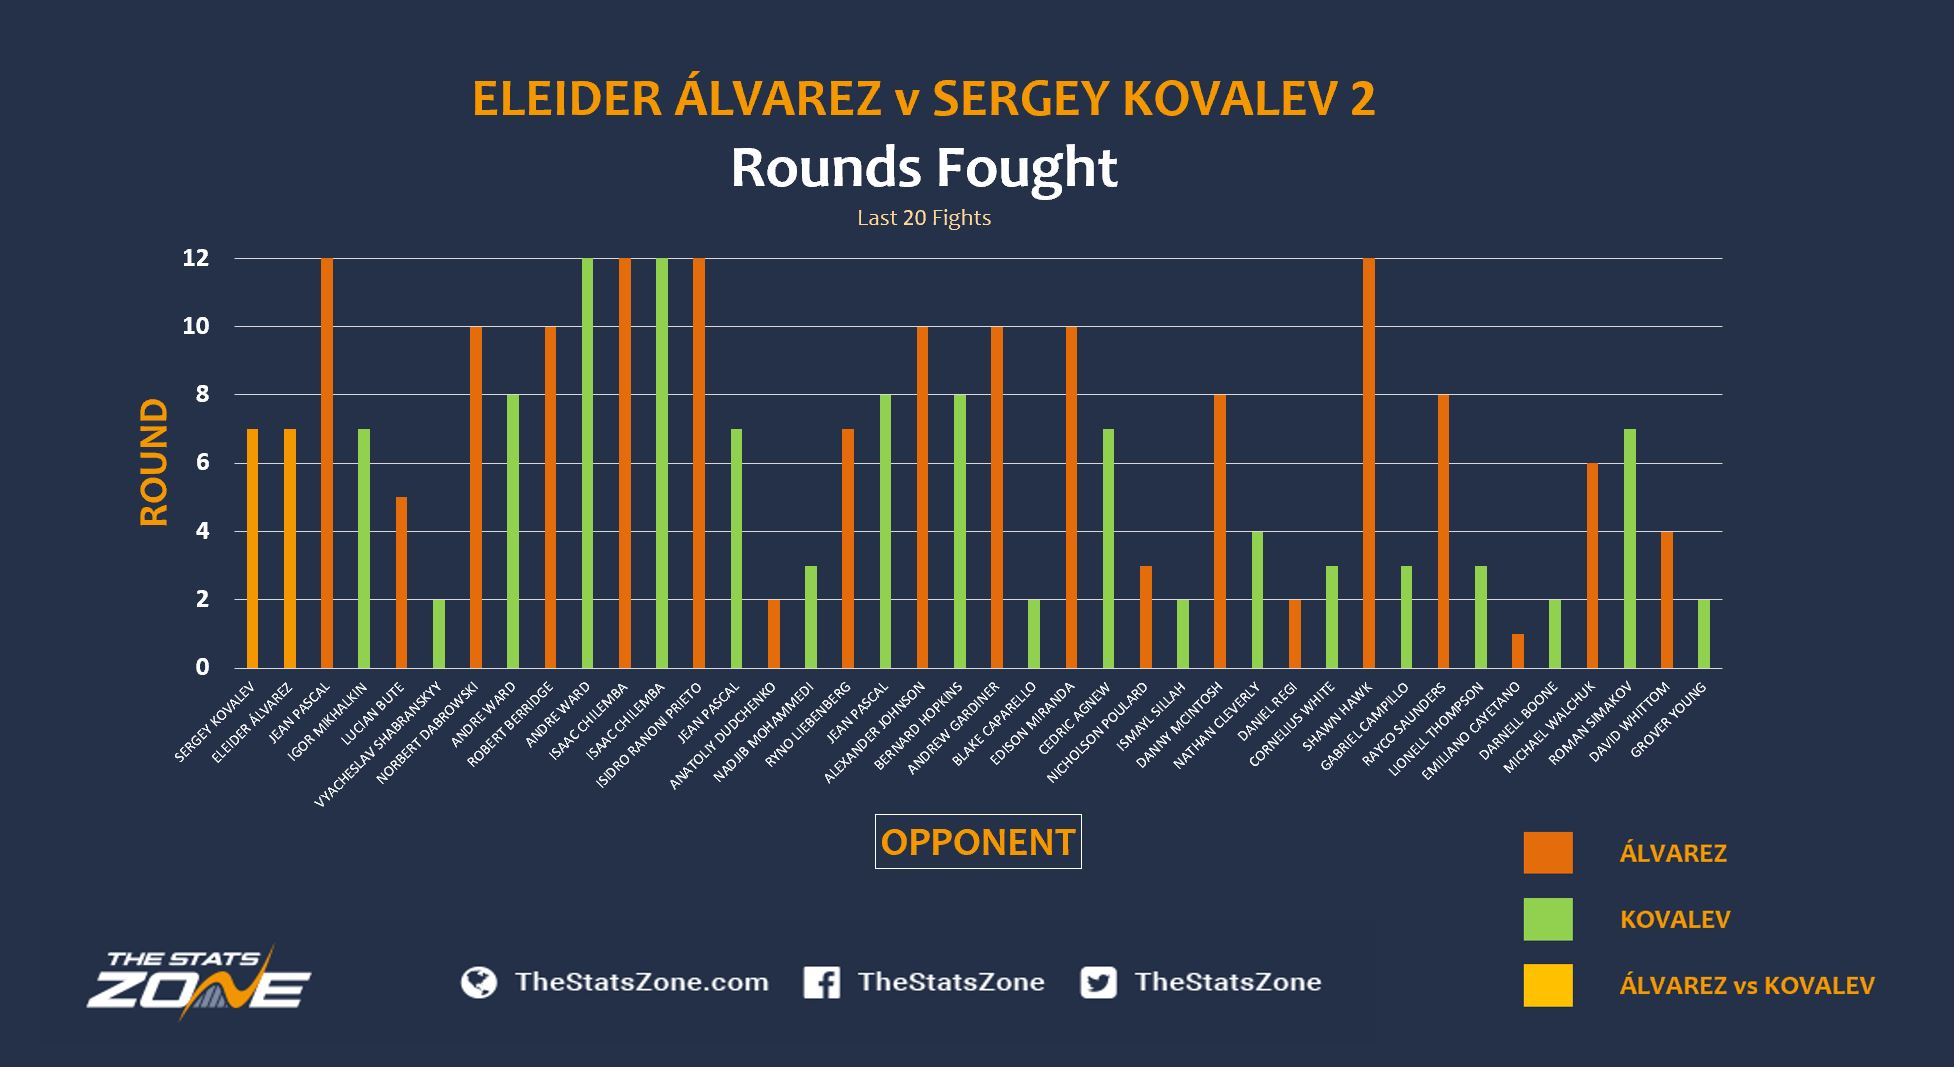 EA v SK Rounds Fought.JPG